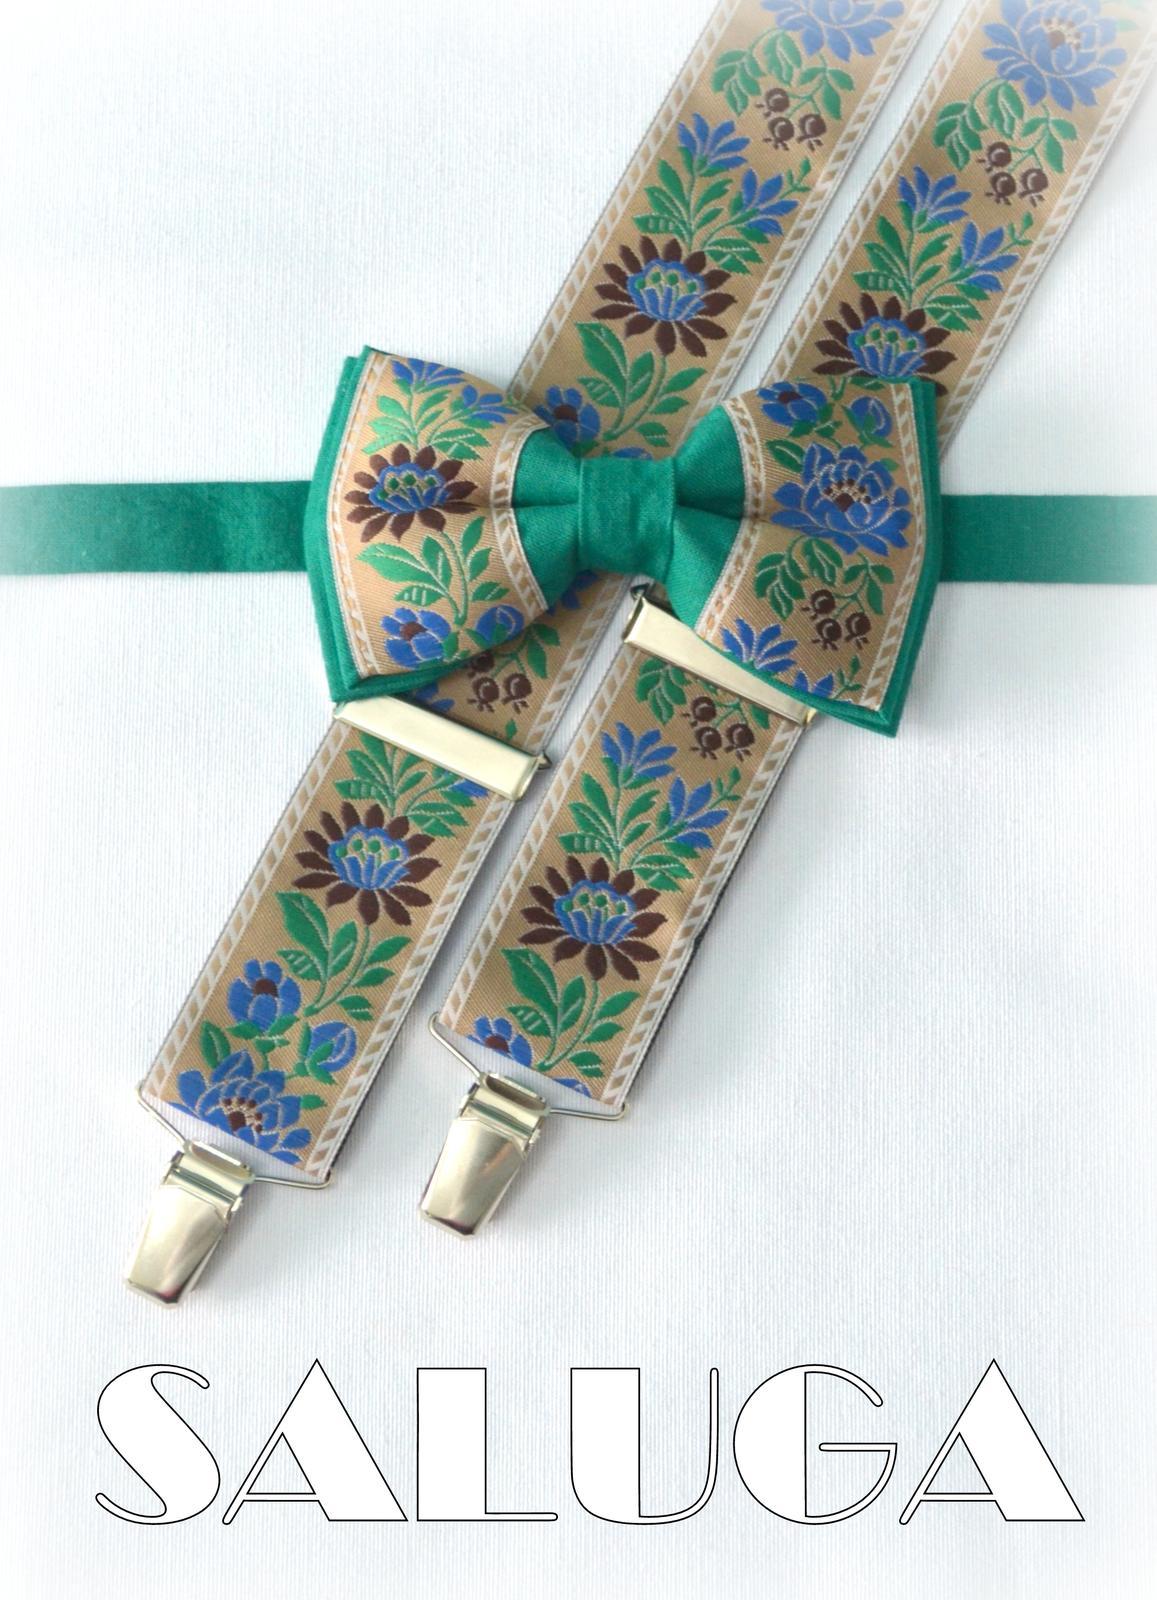 Folklórny pánsky zelený motýlik a traky folk - Obrázok č. 1